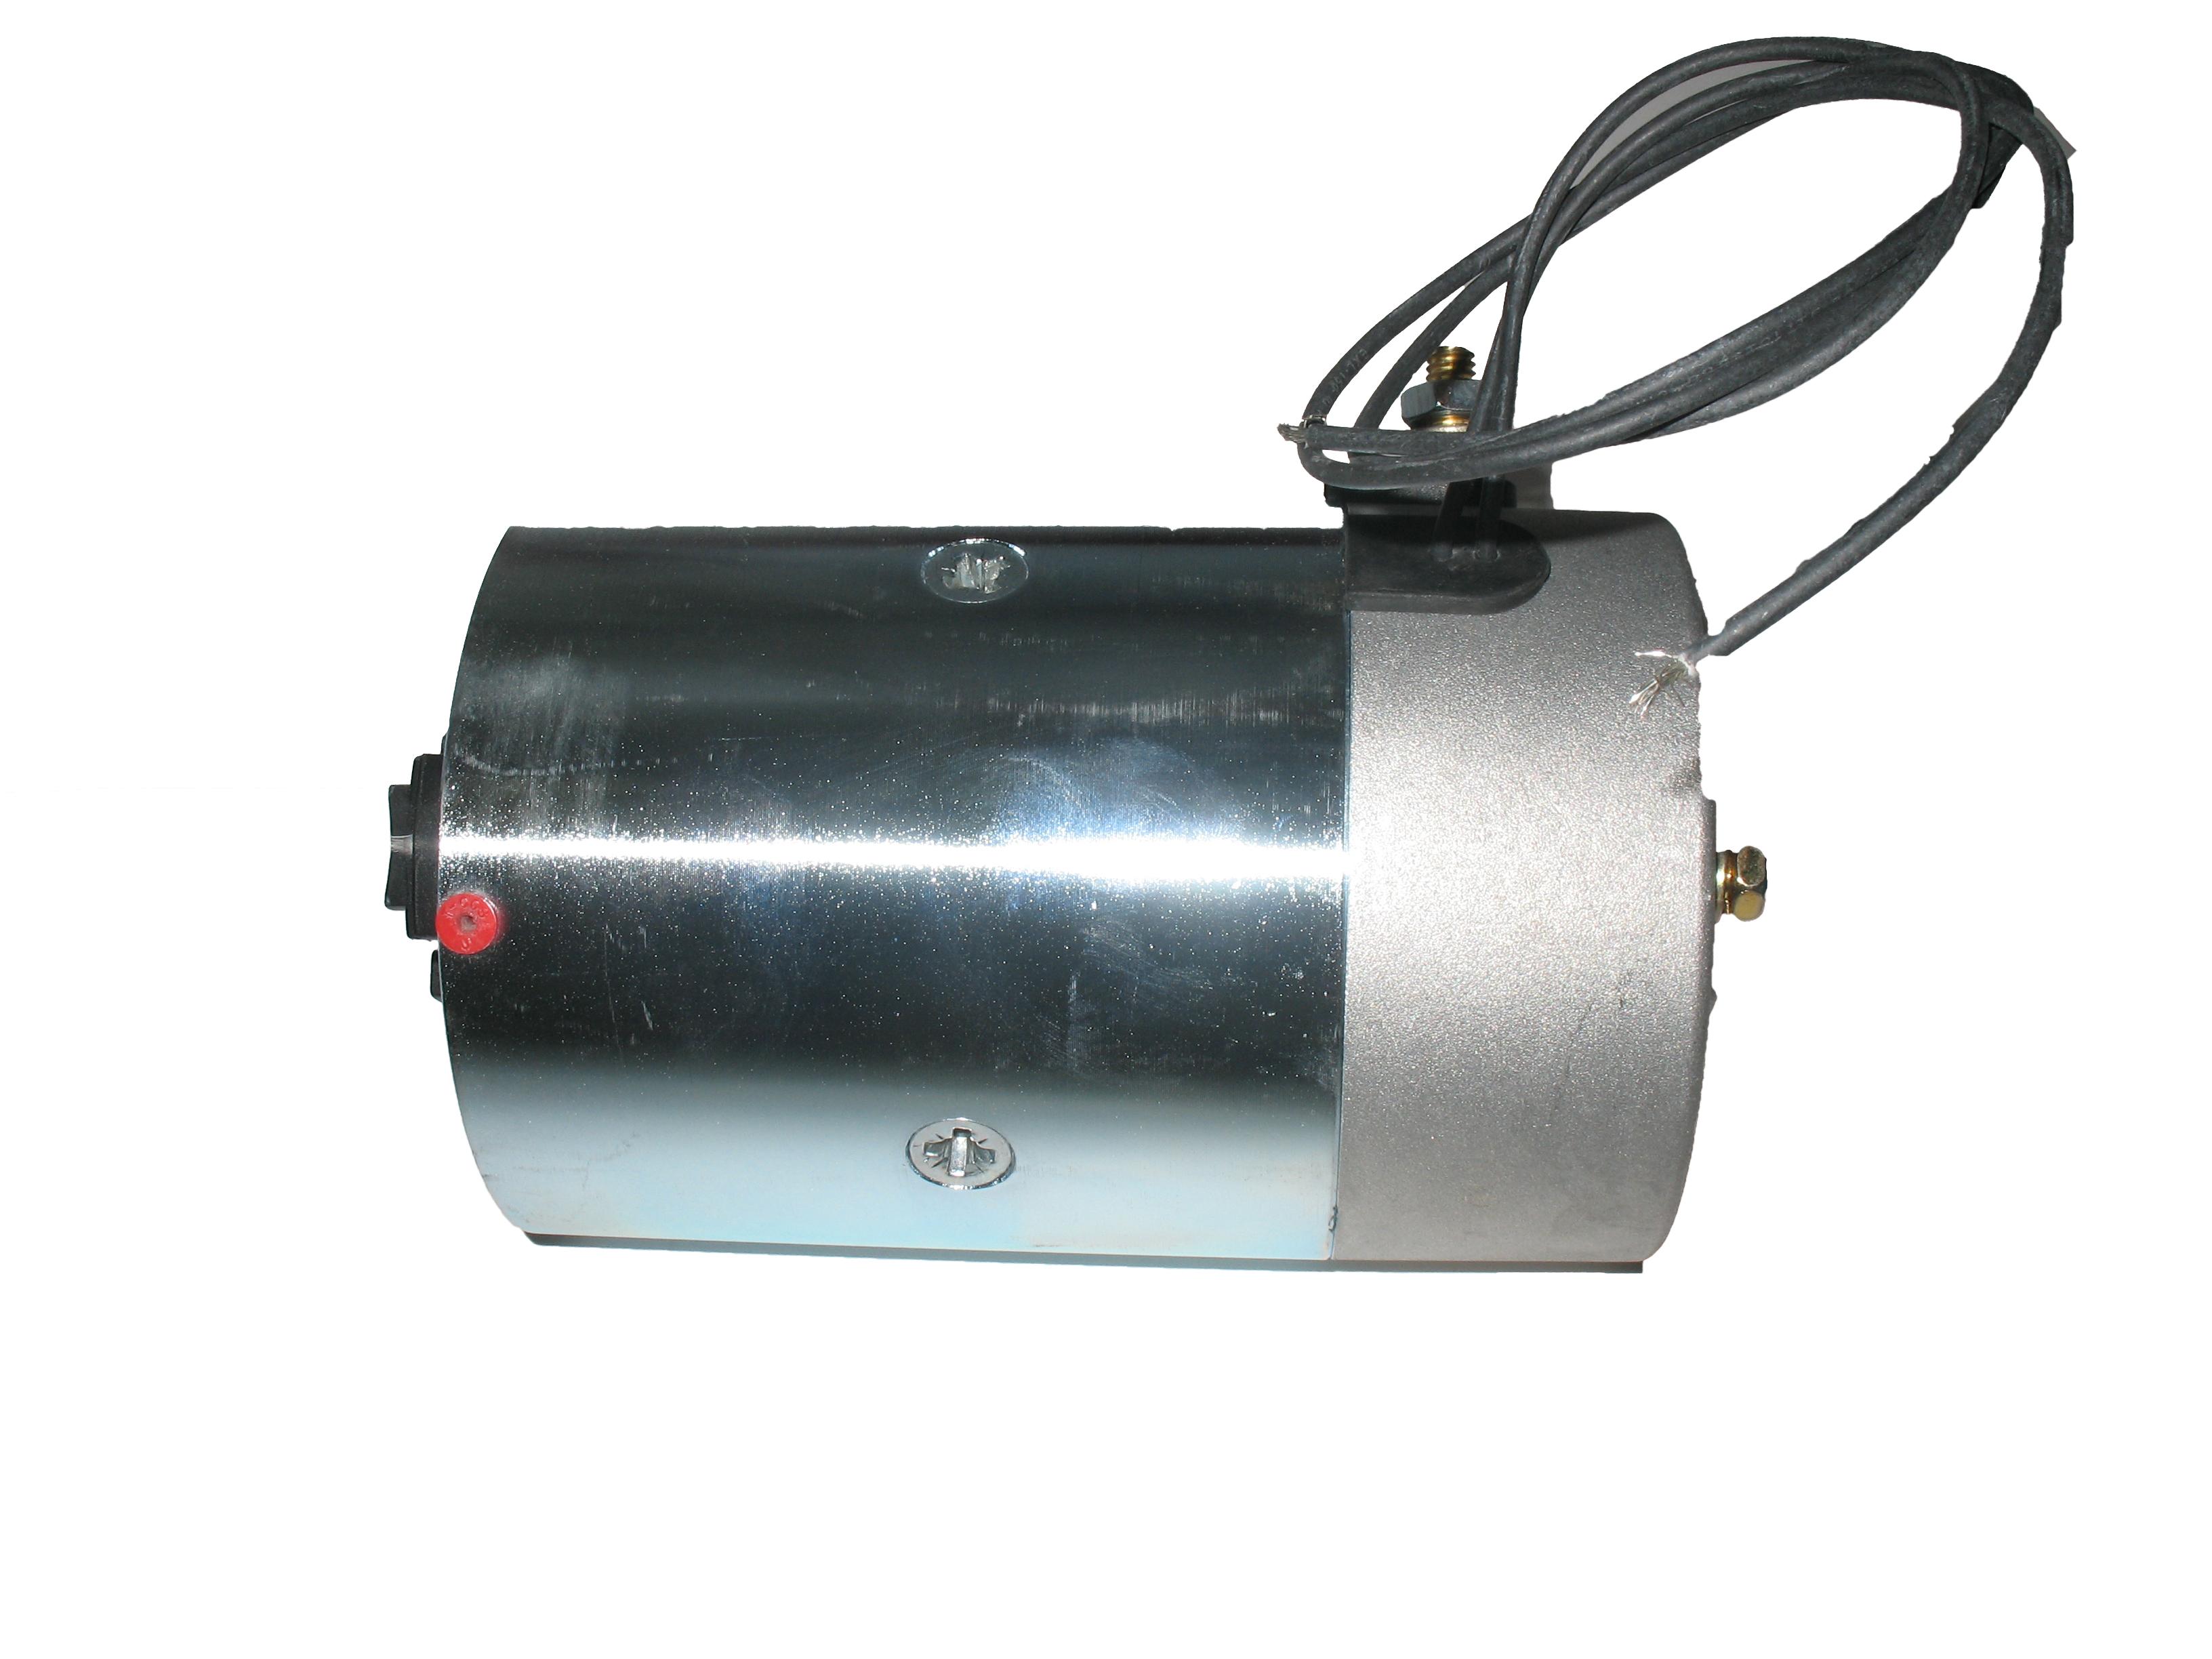 Liftgate Parts And Diagrams Leyman Monarch 12 Volt Hydraulic Pump Wiring Diagram 12v Heavy Duty Thermal Tang Shaft Ccw Motor Waltco